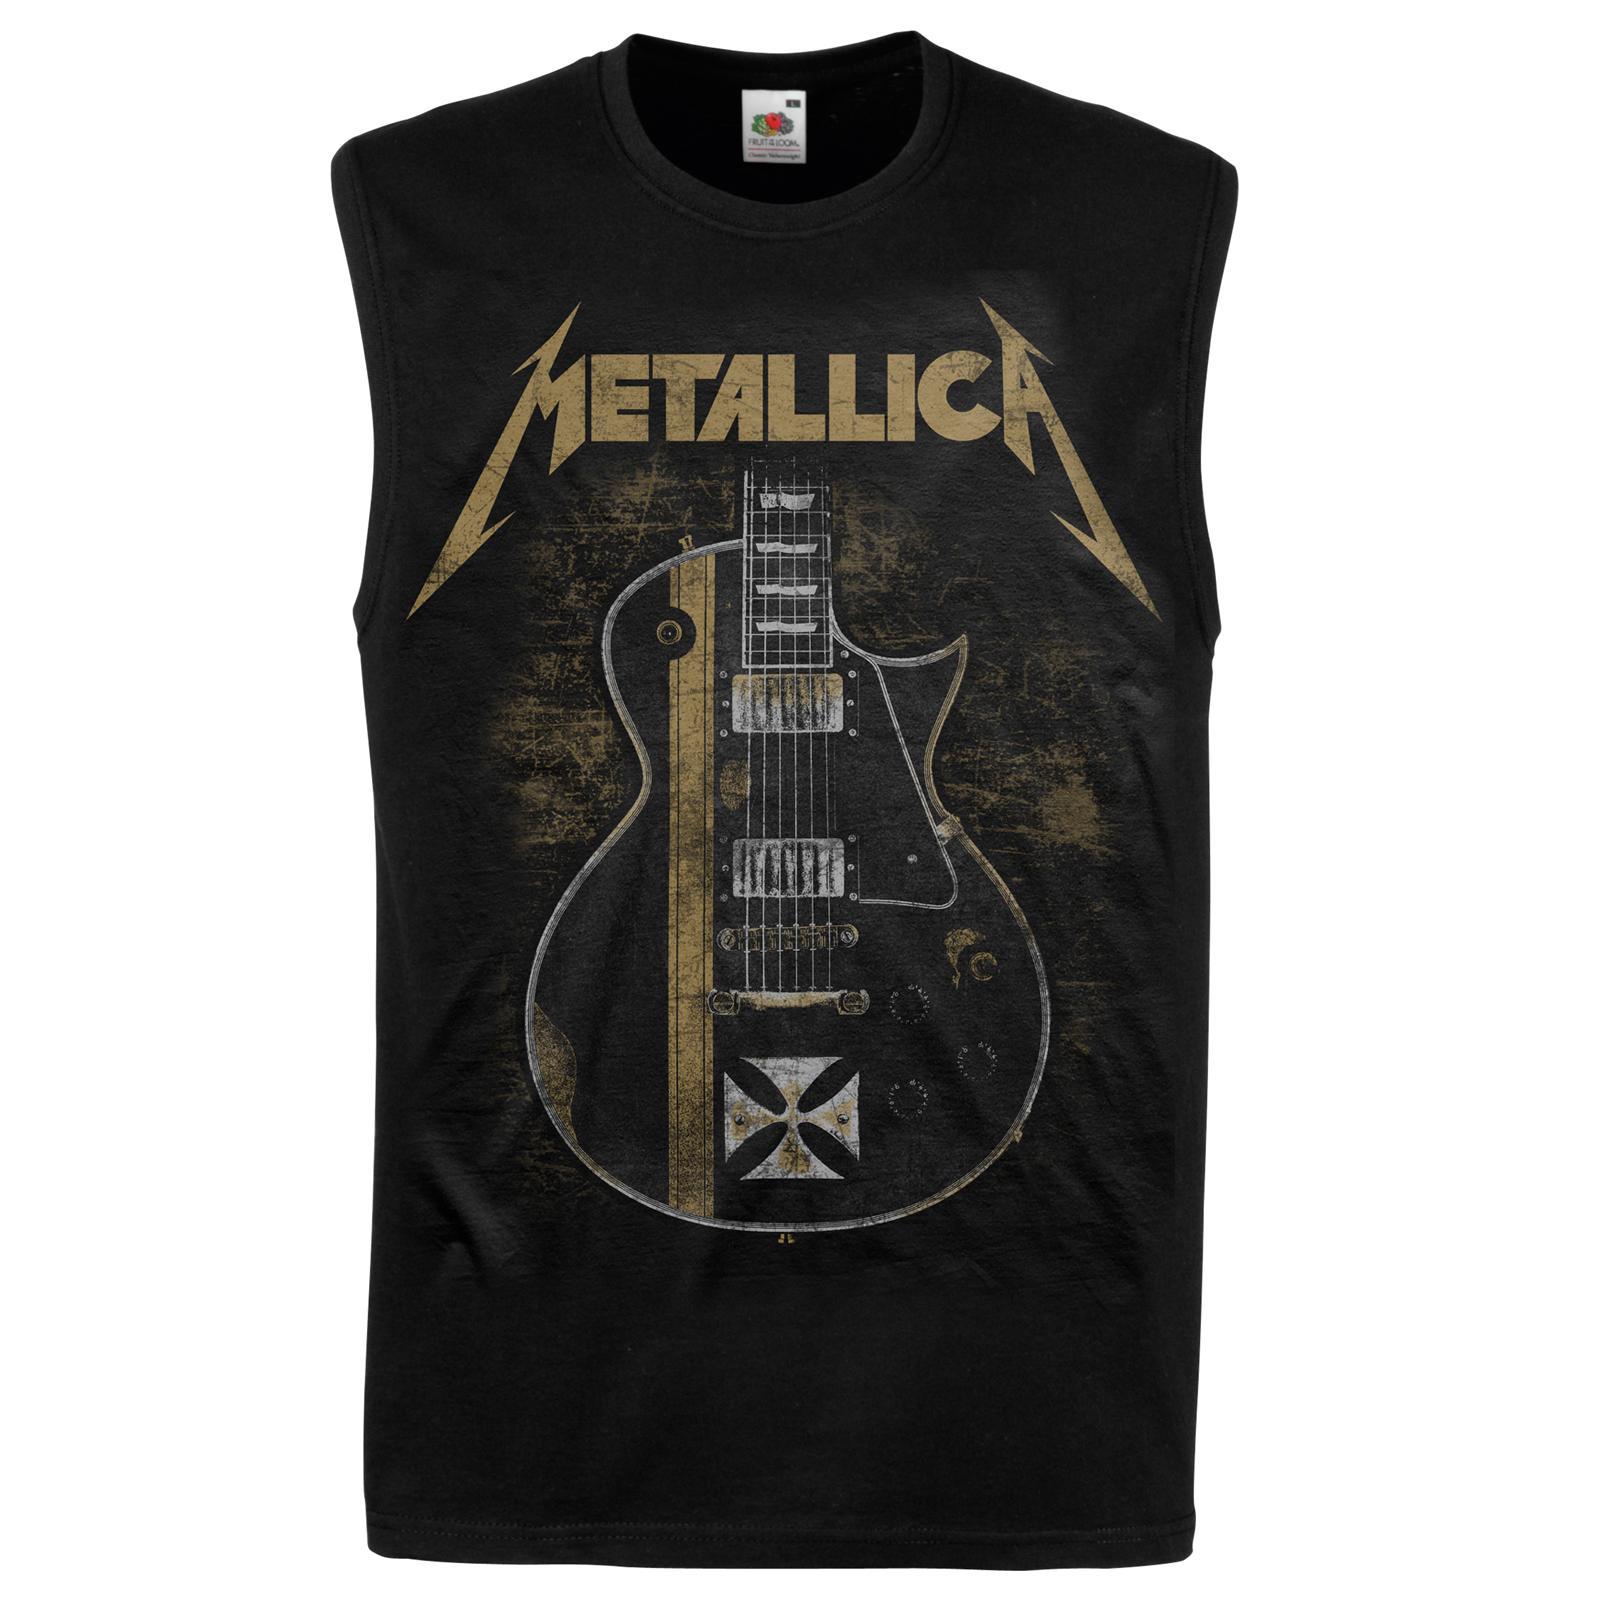 Metallica Hetfield Iron Cross Black Sleeveless Top